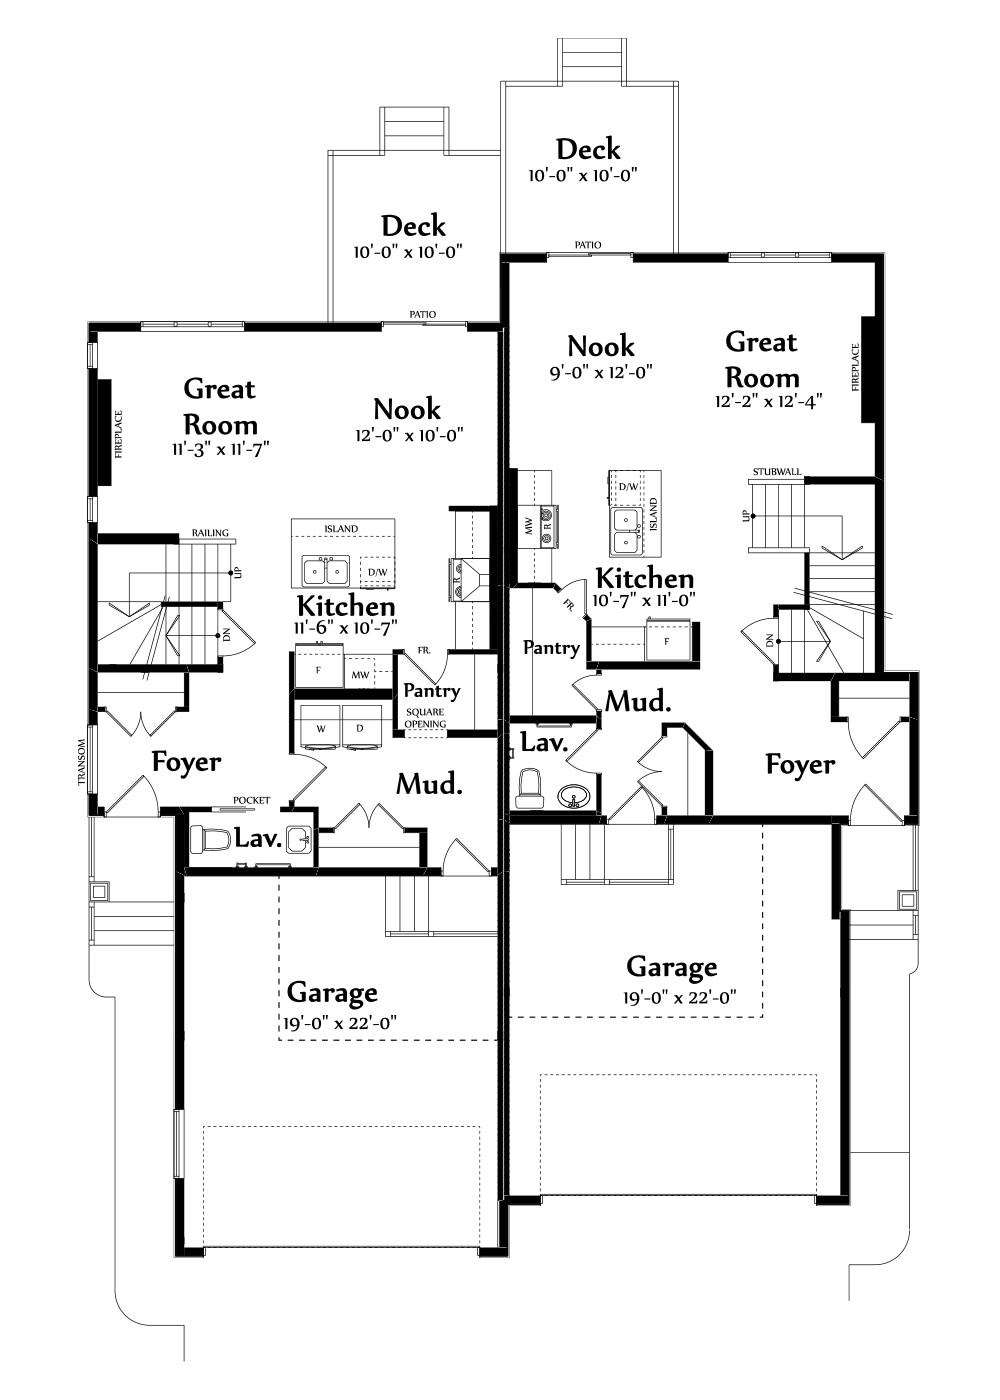 LucasEmmersonC main floorplan 751 744